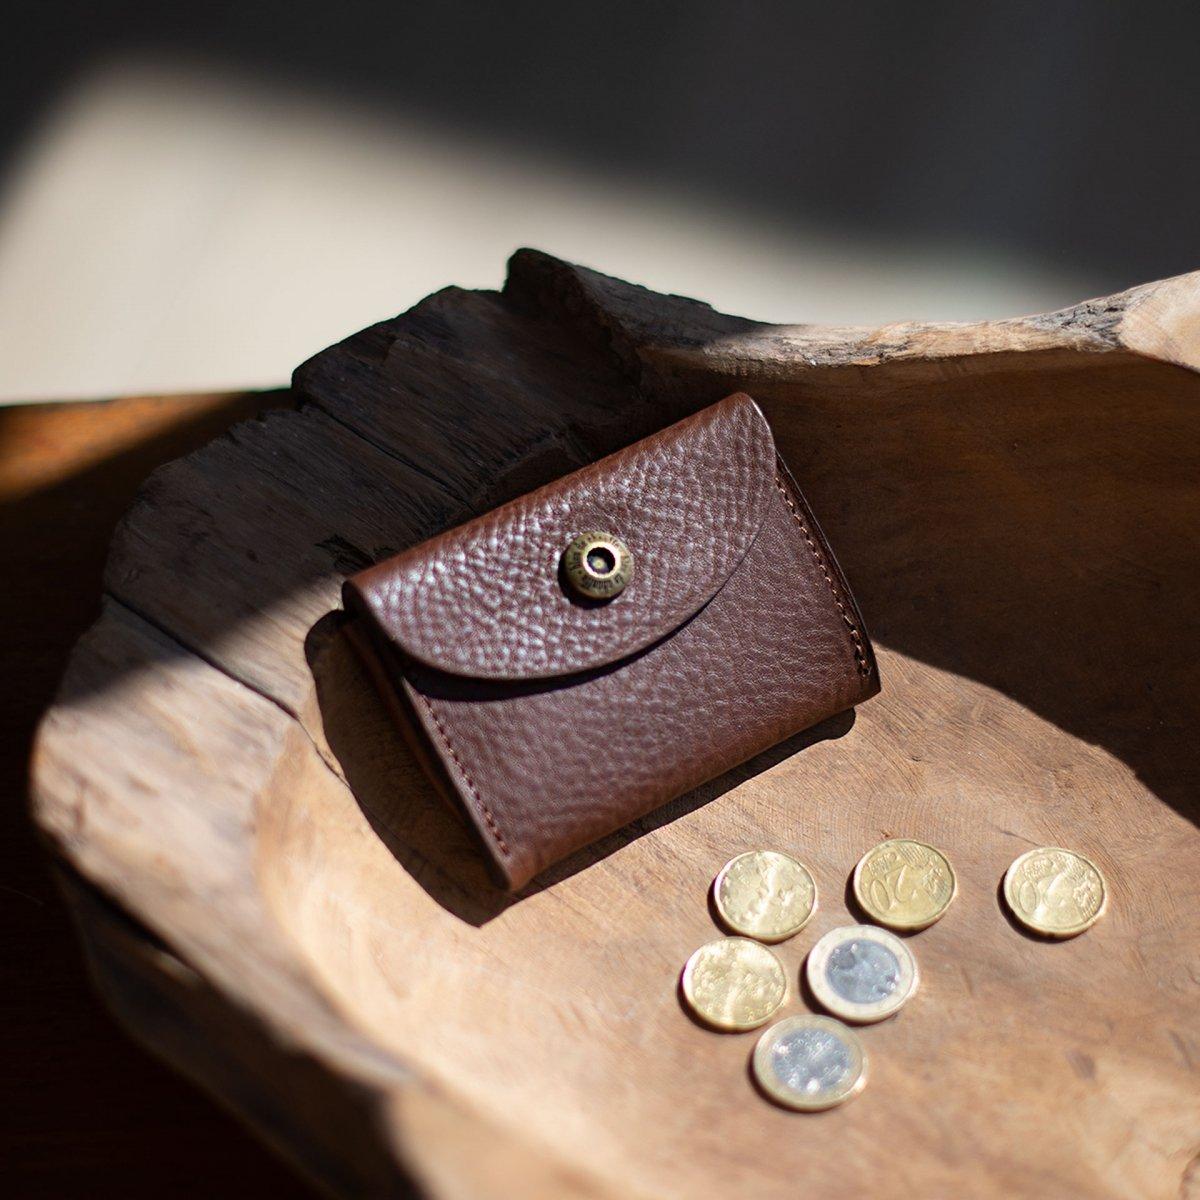 Talbin Shoemaker purse - Cuba Libre (image n°4)